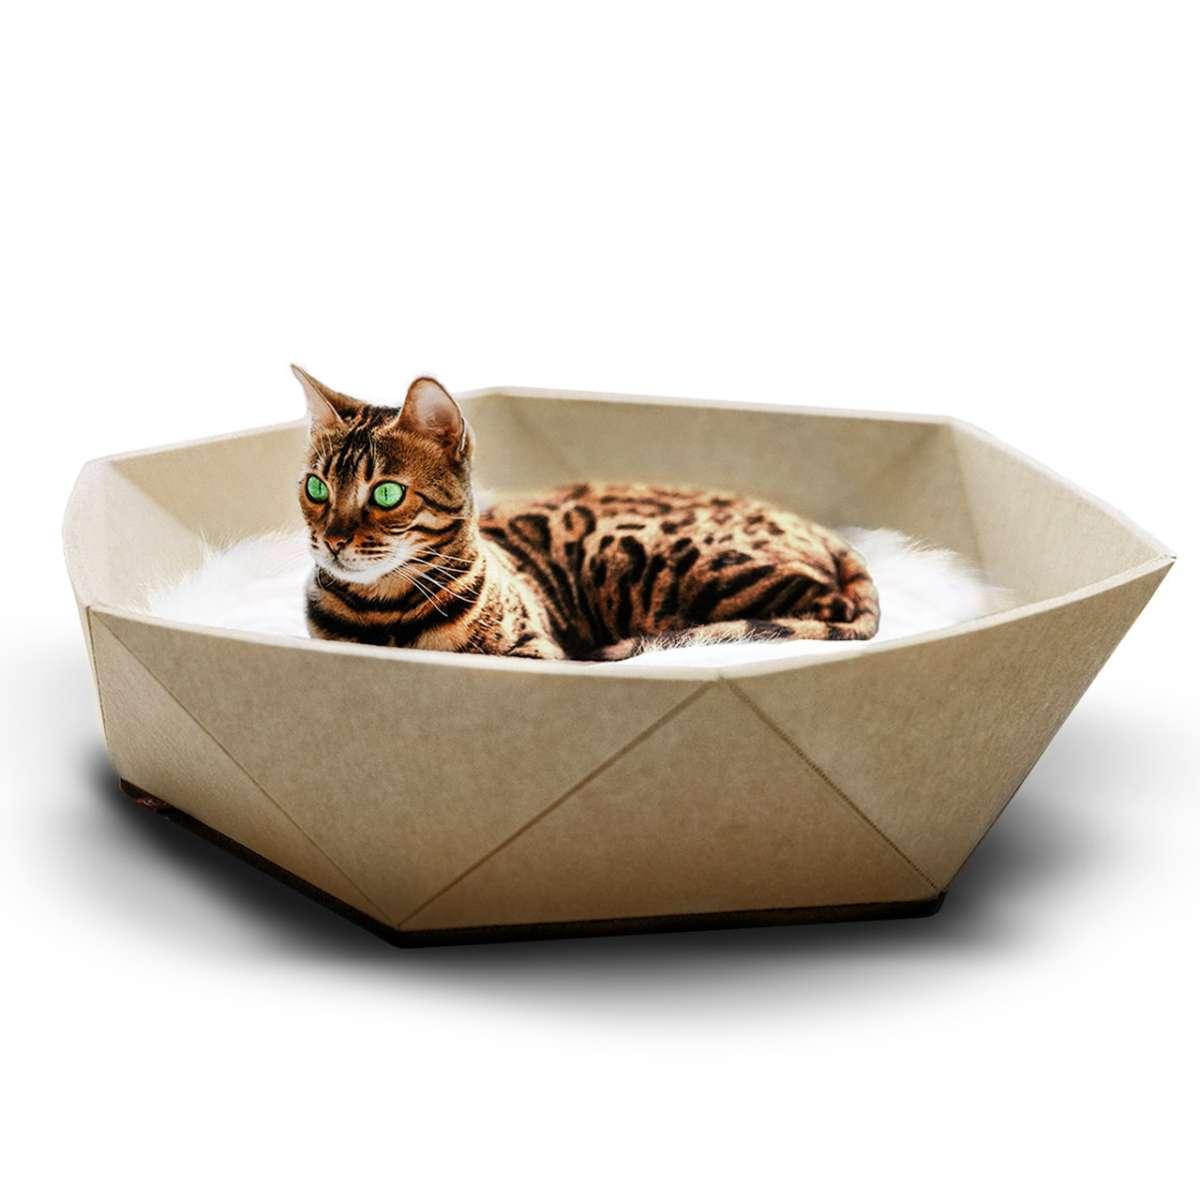 Katzenkorb Zoey aus Filz   beige   Designbett für Katzen